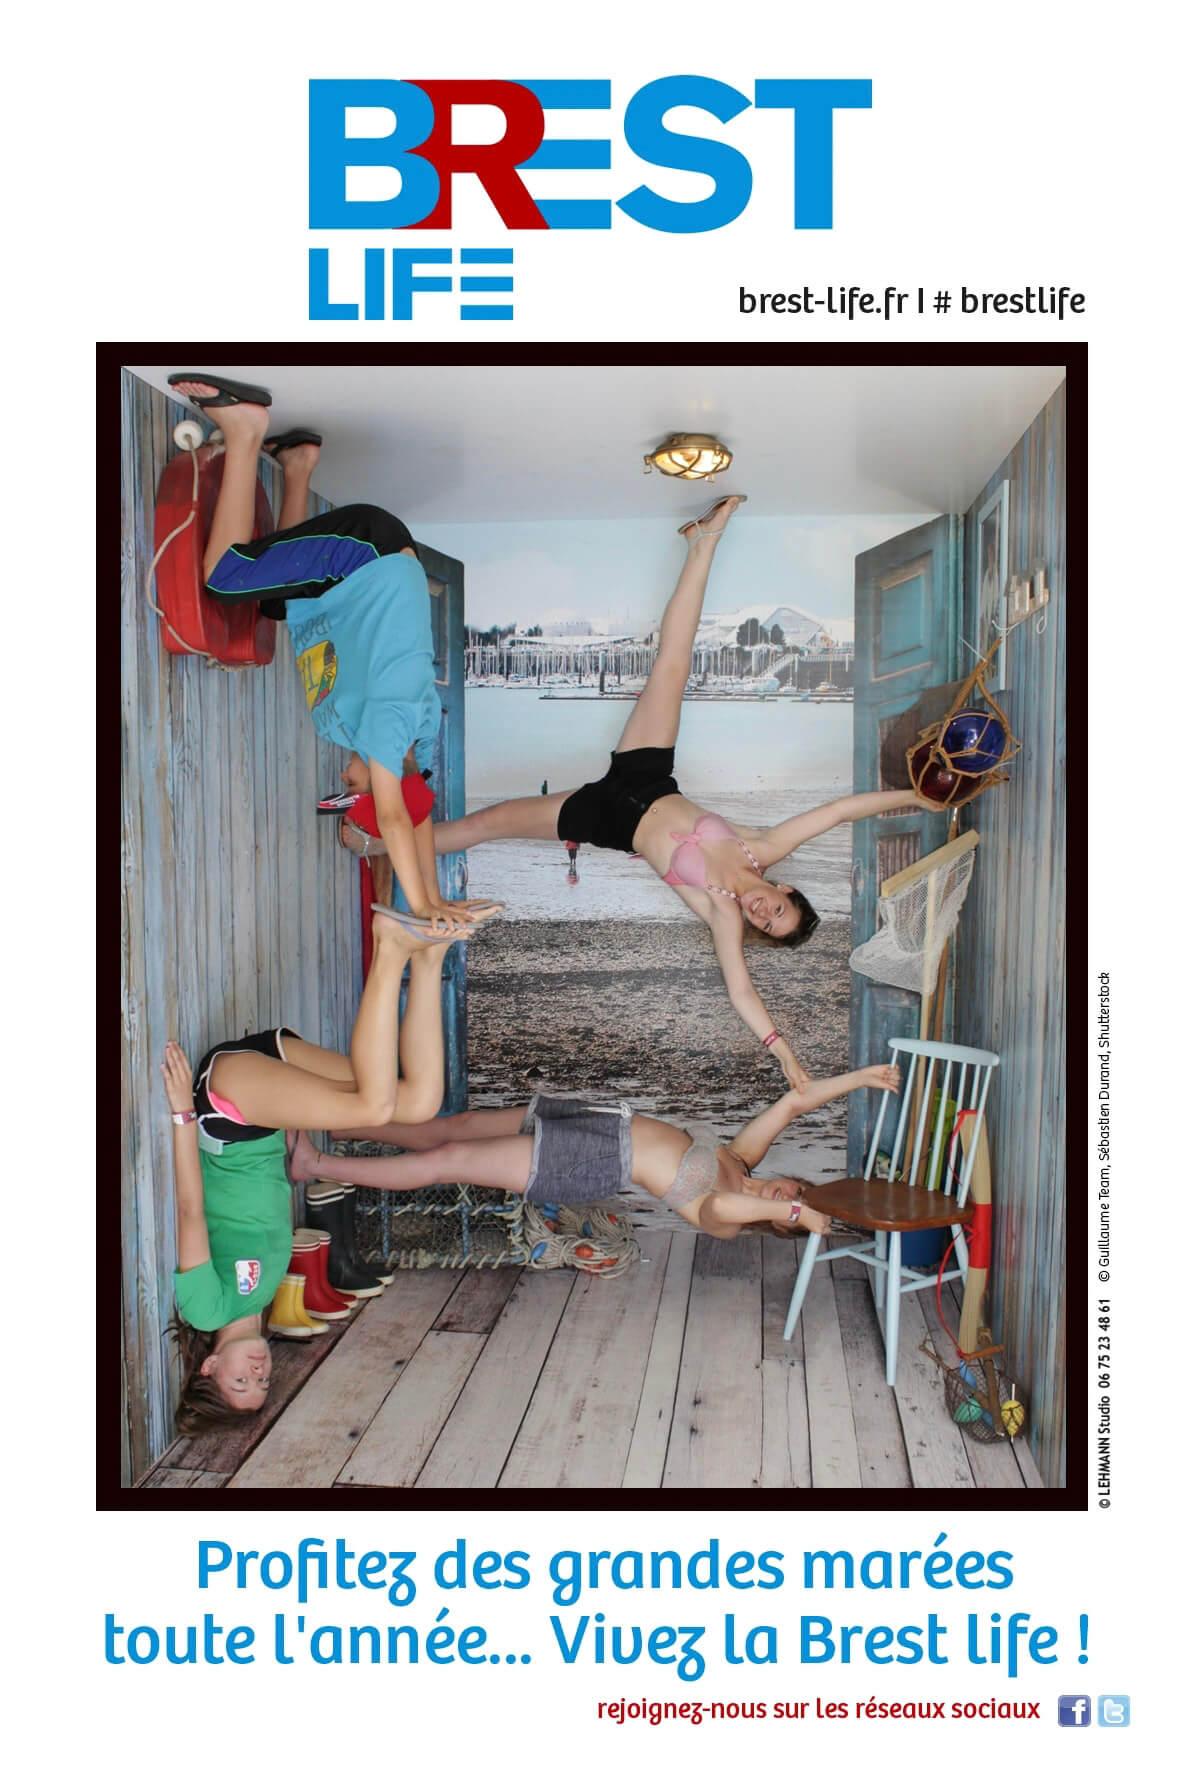 lehman-studio-photographe-angers-evenementiel-gravitybox-ambiance-cabane-de-plage-brest-life3